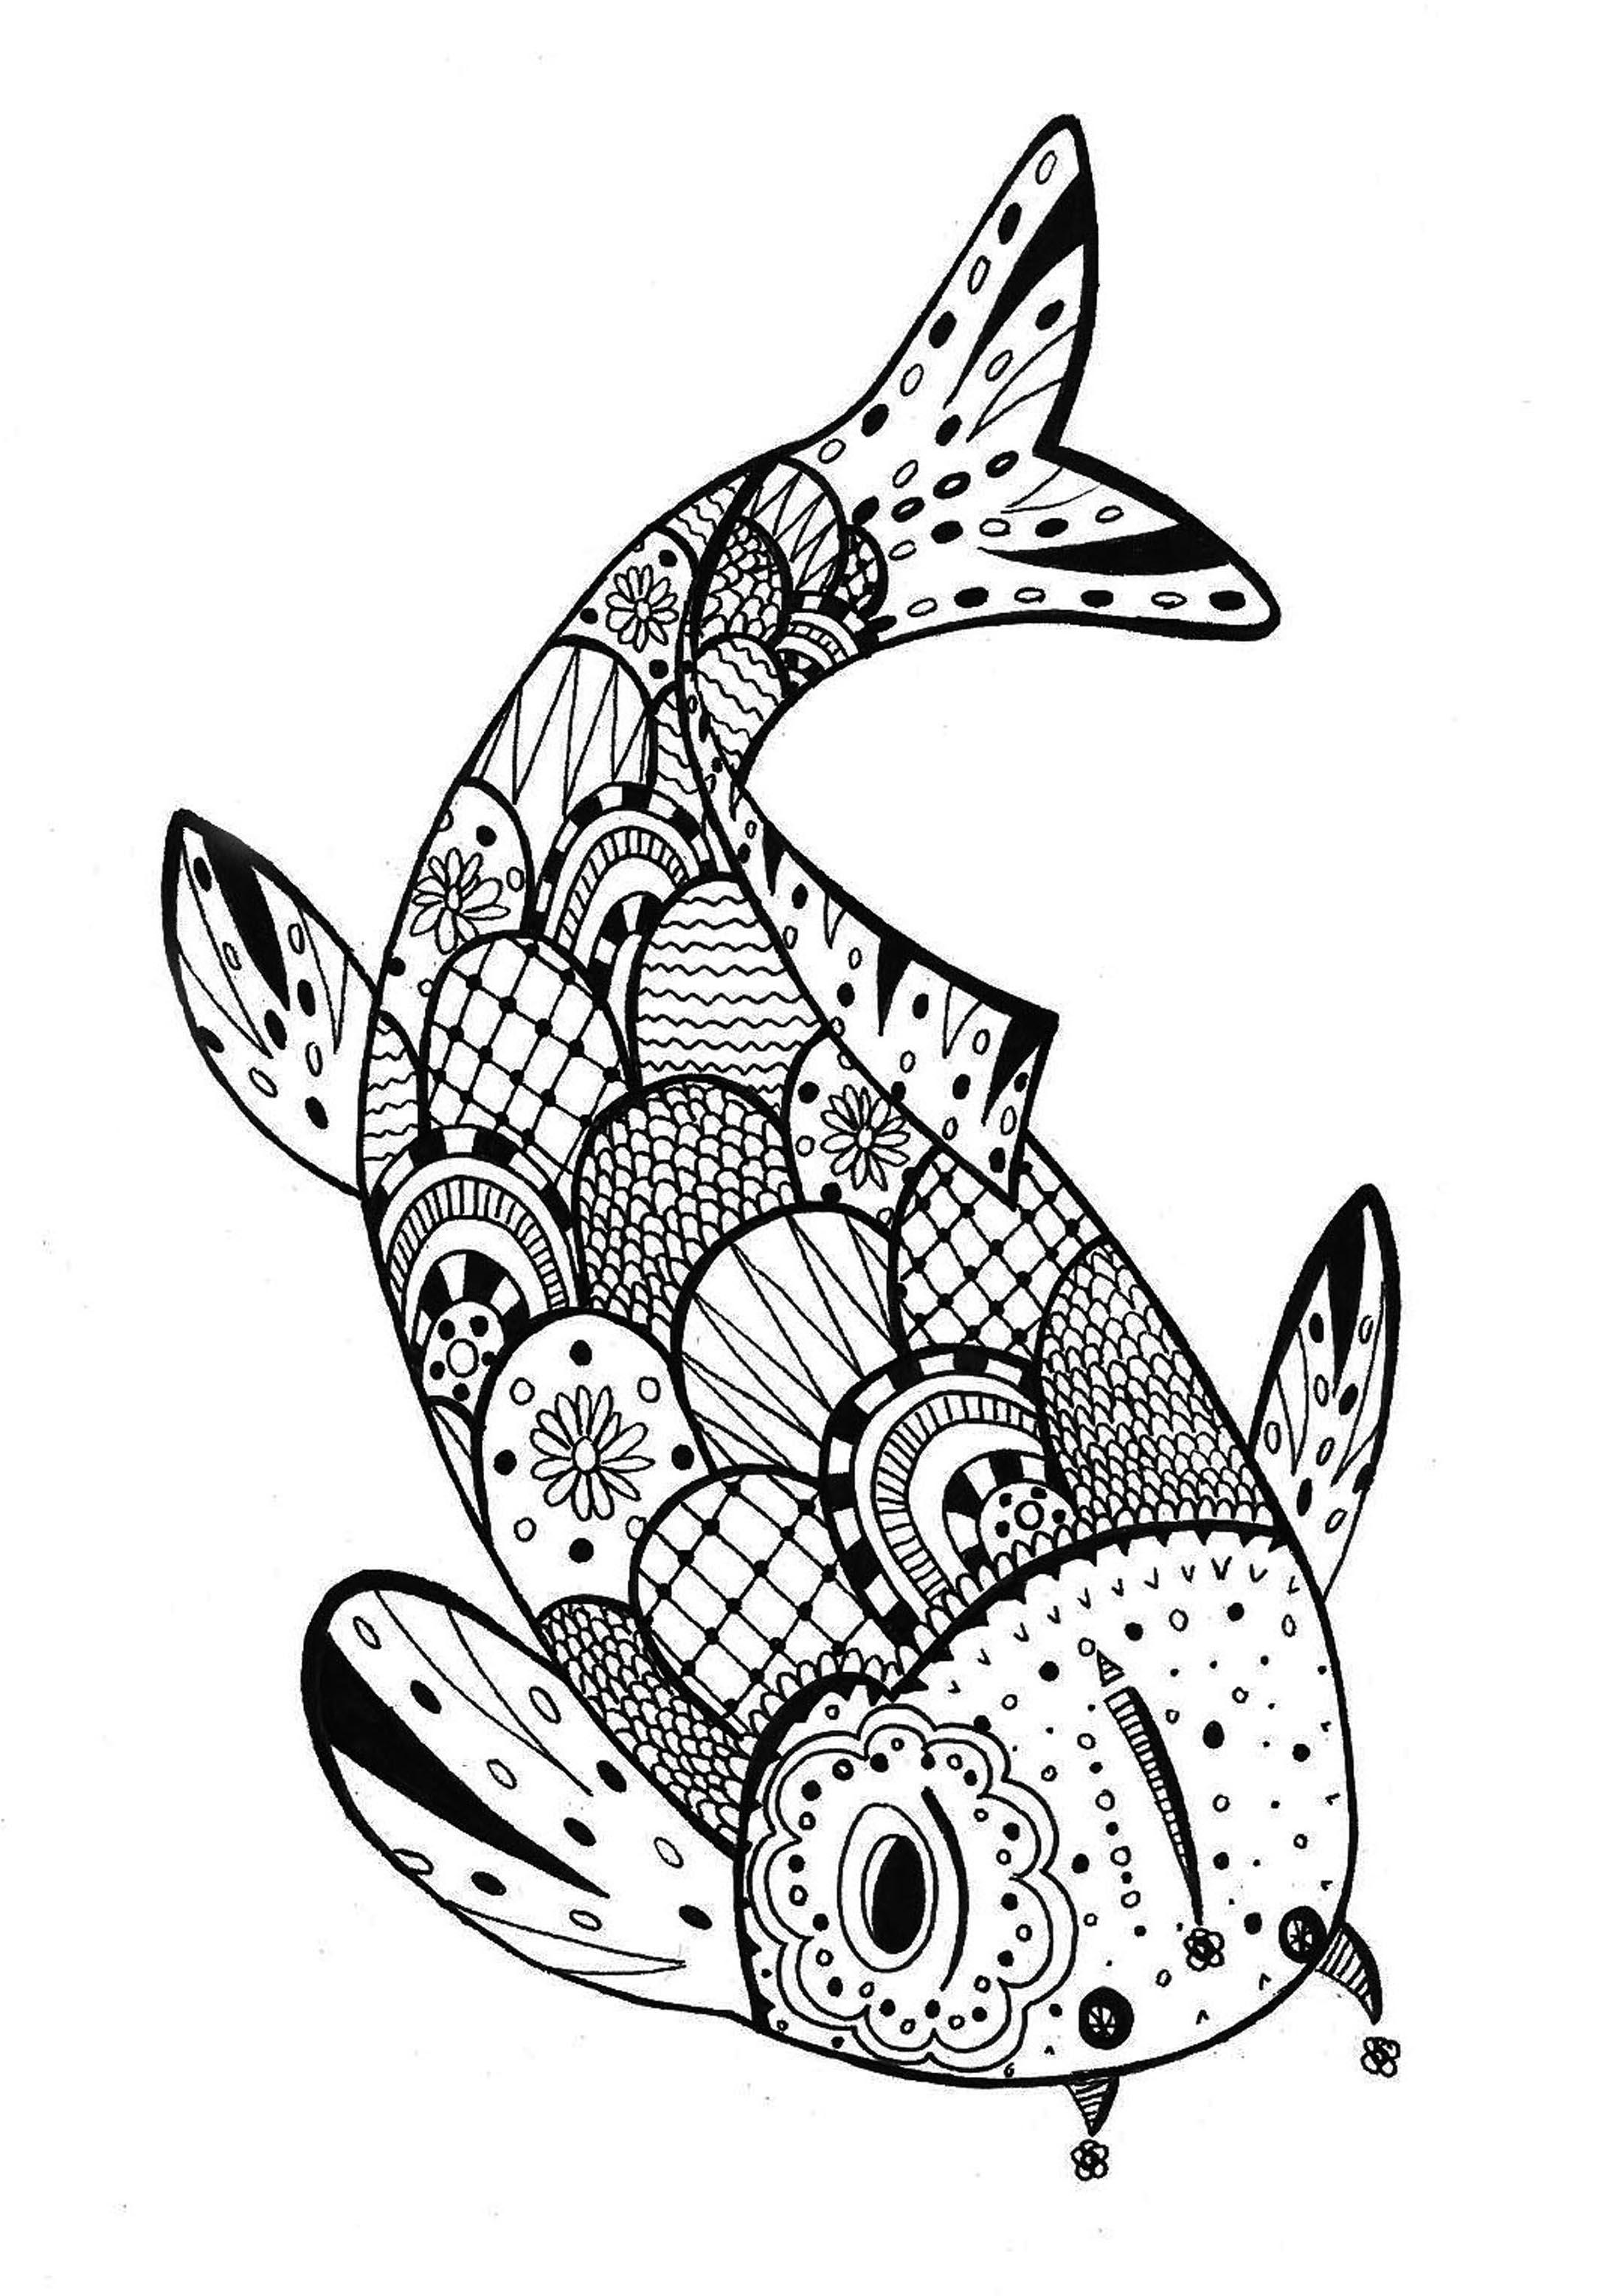 Poisson rachel